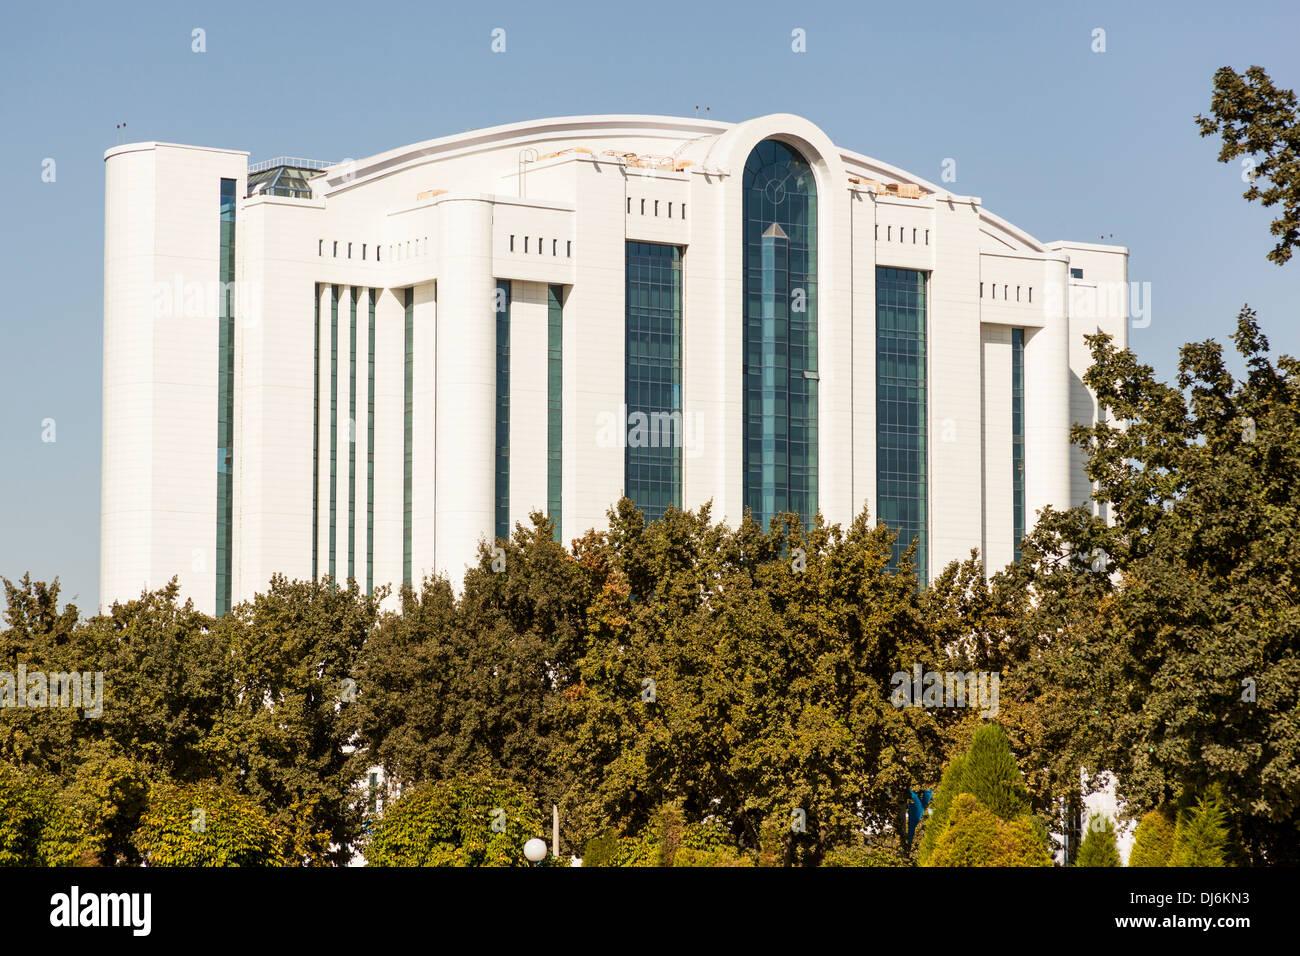 Poytaht Business Complex, Sharaf Rashidov Avenue, Tashkent, Uzbekistan Stock Photo